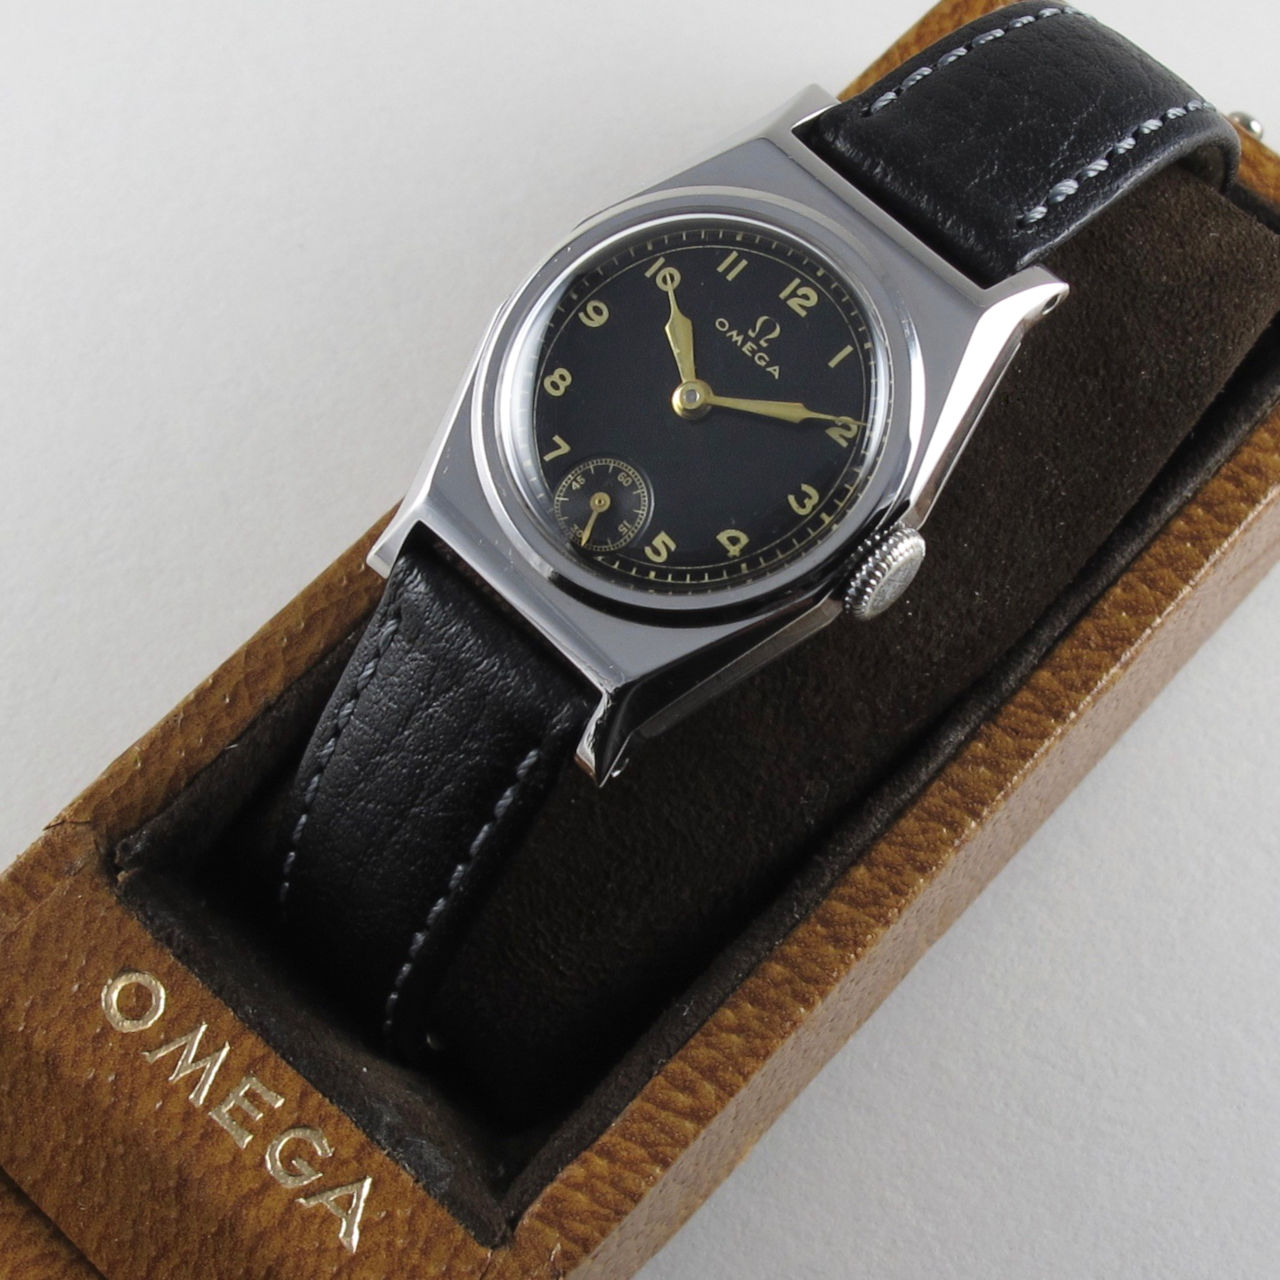 Omega steel vintage wristwatch, circa 1935